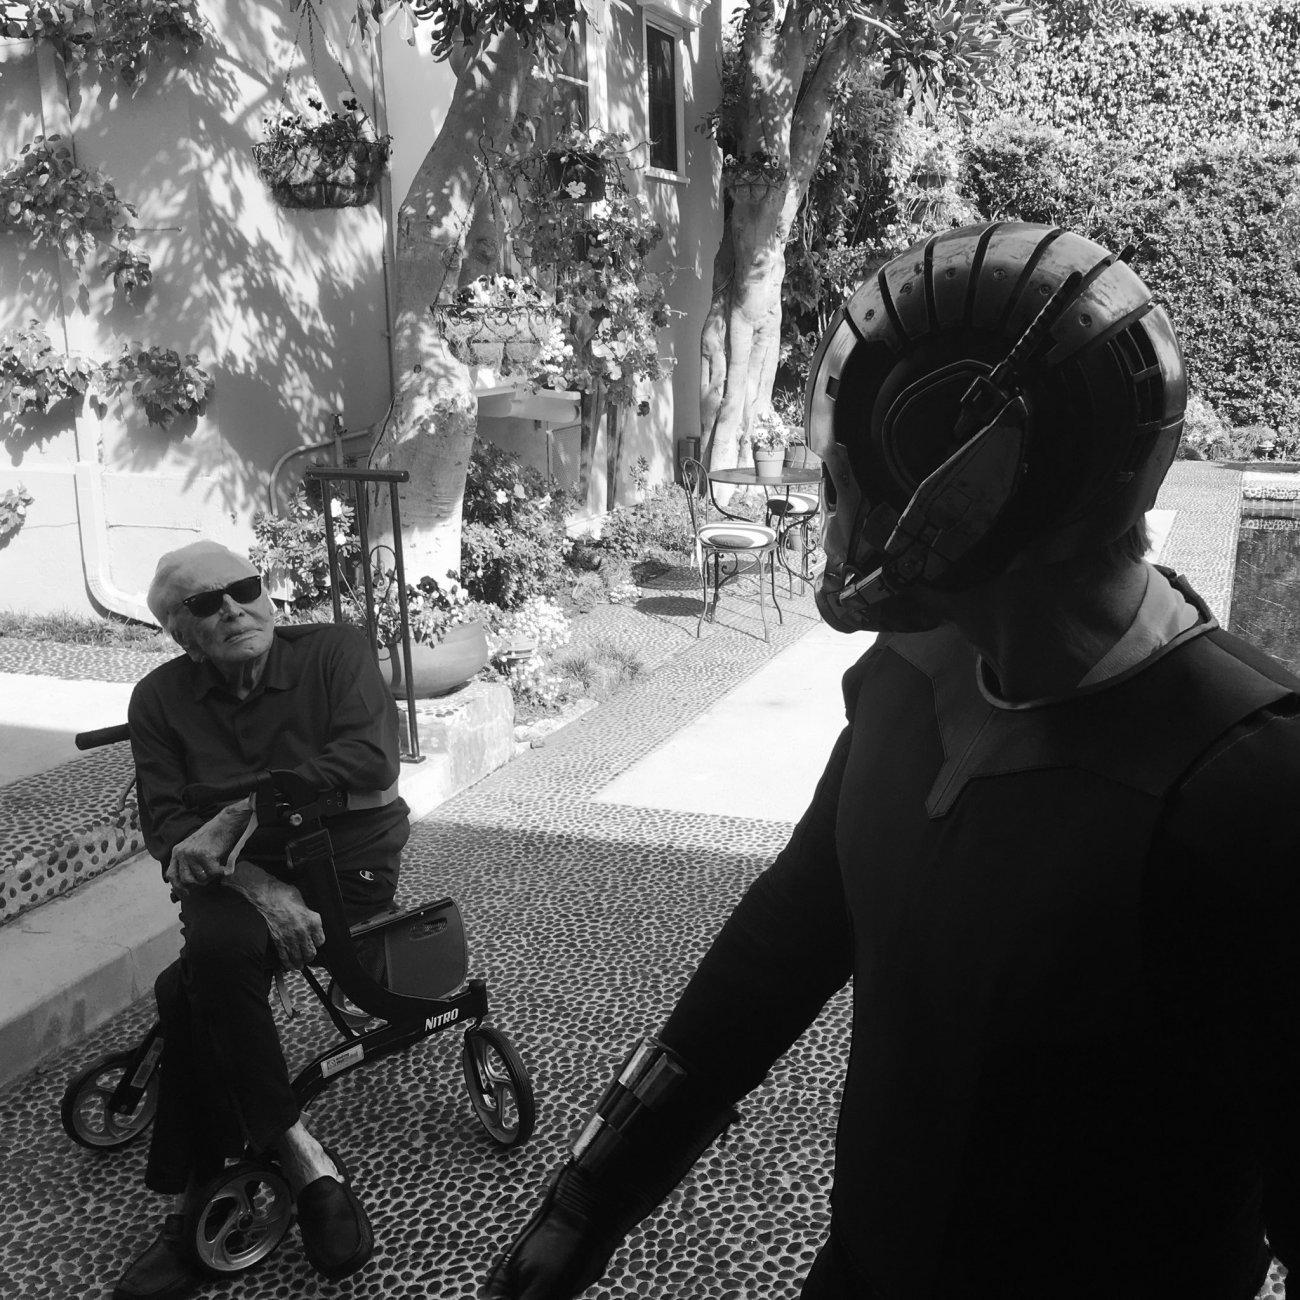 Kirk Douglas (1916-2020) y Michael Douglas en el set de Ant-Man and the Wasp (2018). Imagen: Peyton Reed Twitter (@MrPeytonReed).